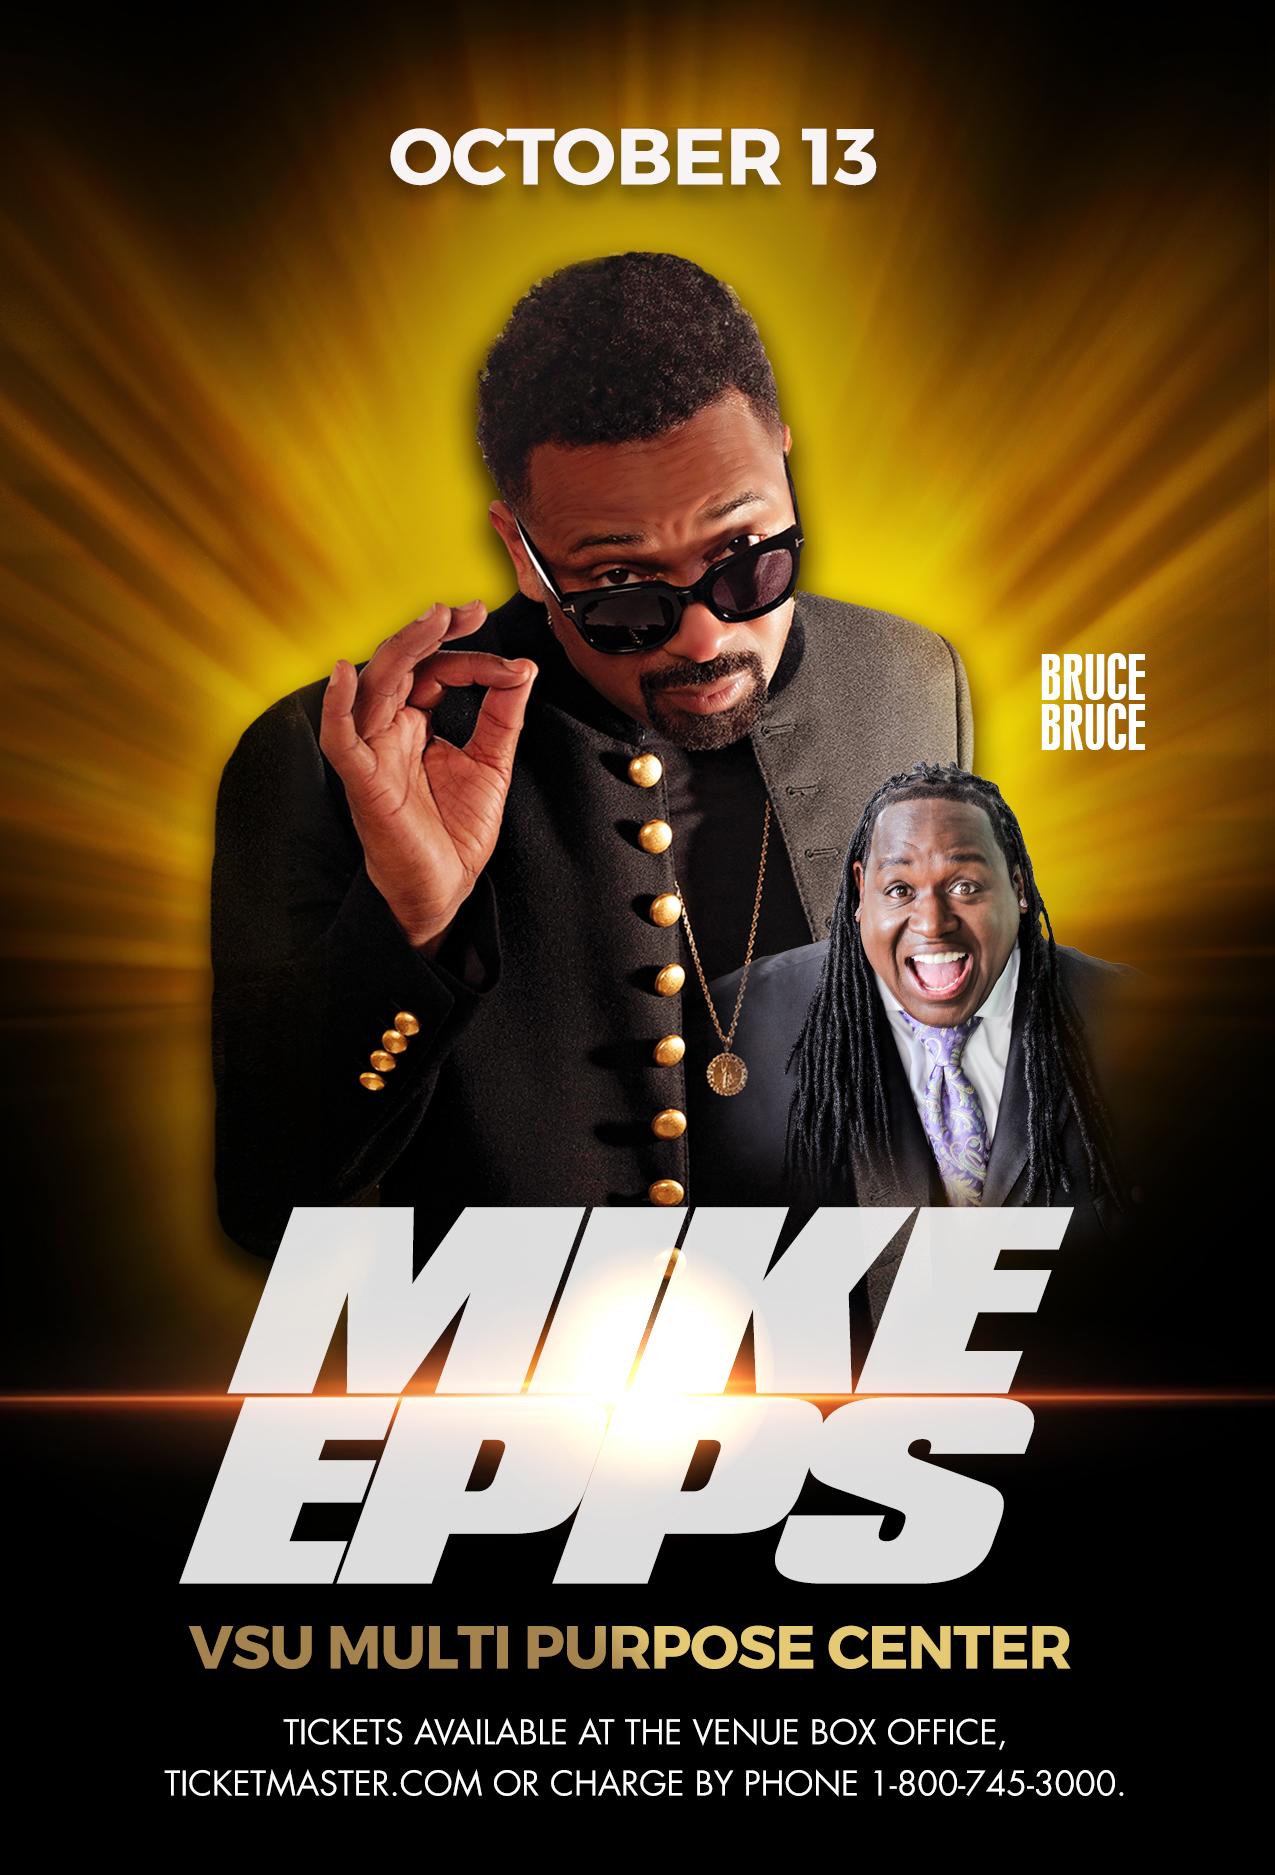 Mike Epps & Bruce Bruce